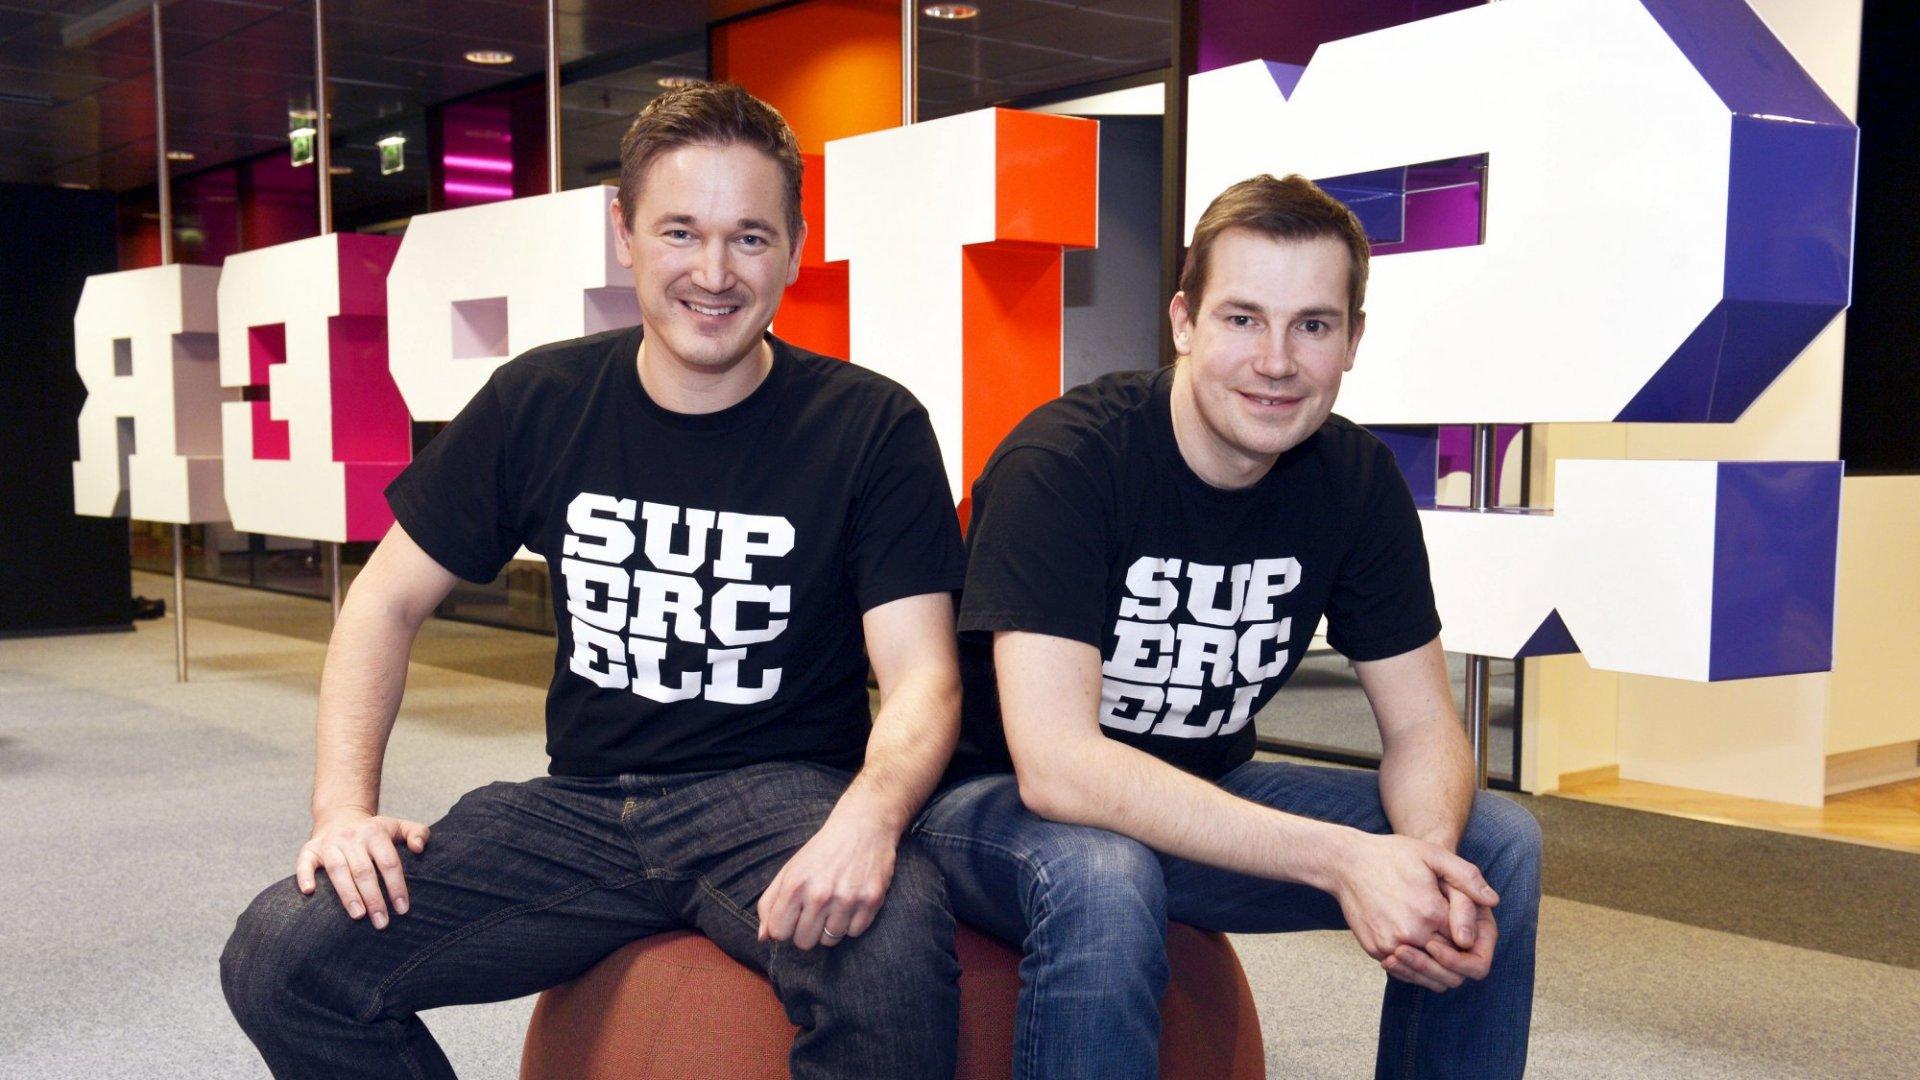 Supercell CEO Ilkka Paananen (left) and creative director Mikko Kodisoja at company headquarters in Helsinki.